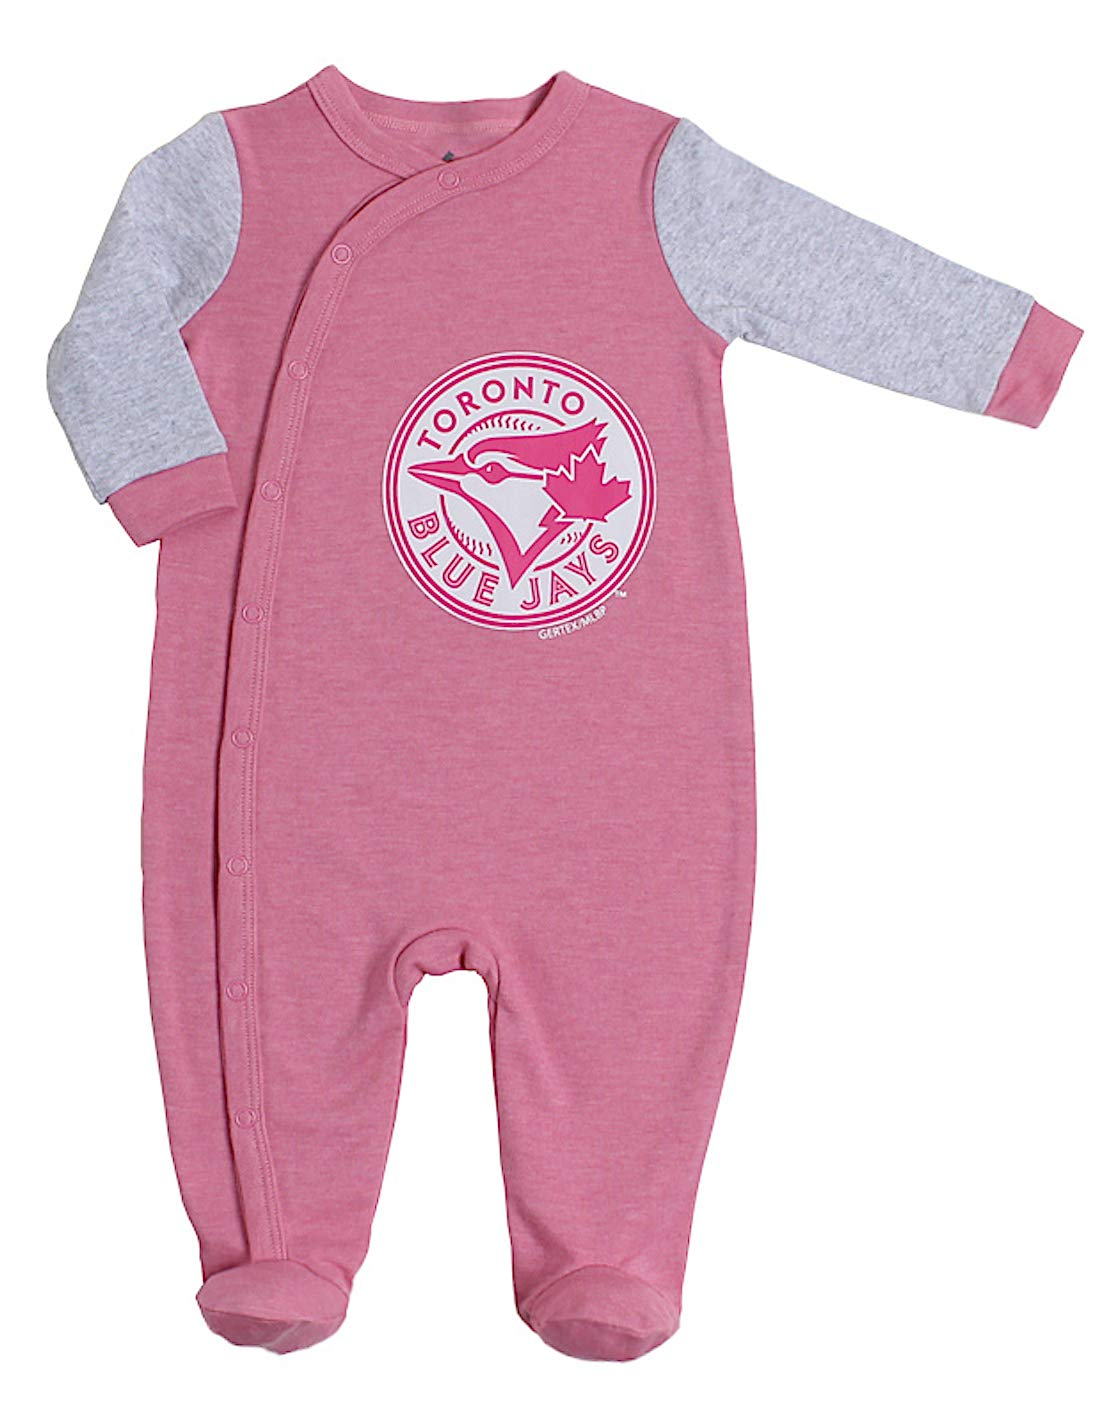 MLB Toronto Blue Jays Toddler Sleeper 9 Months Gertex